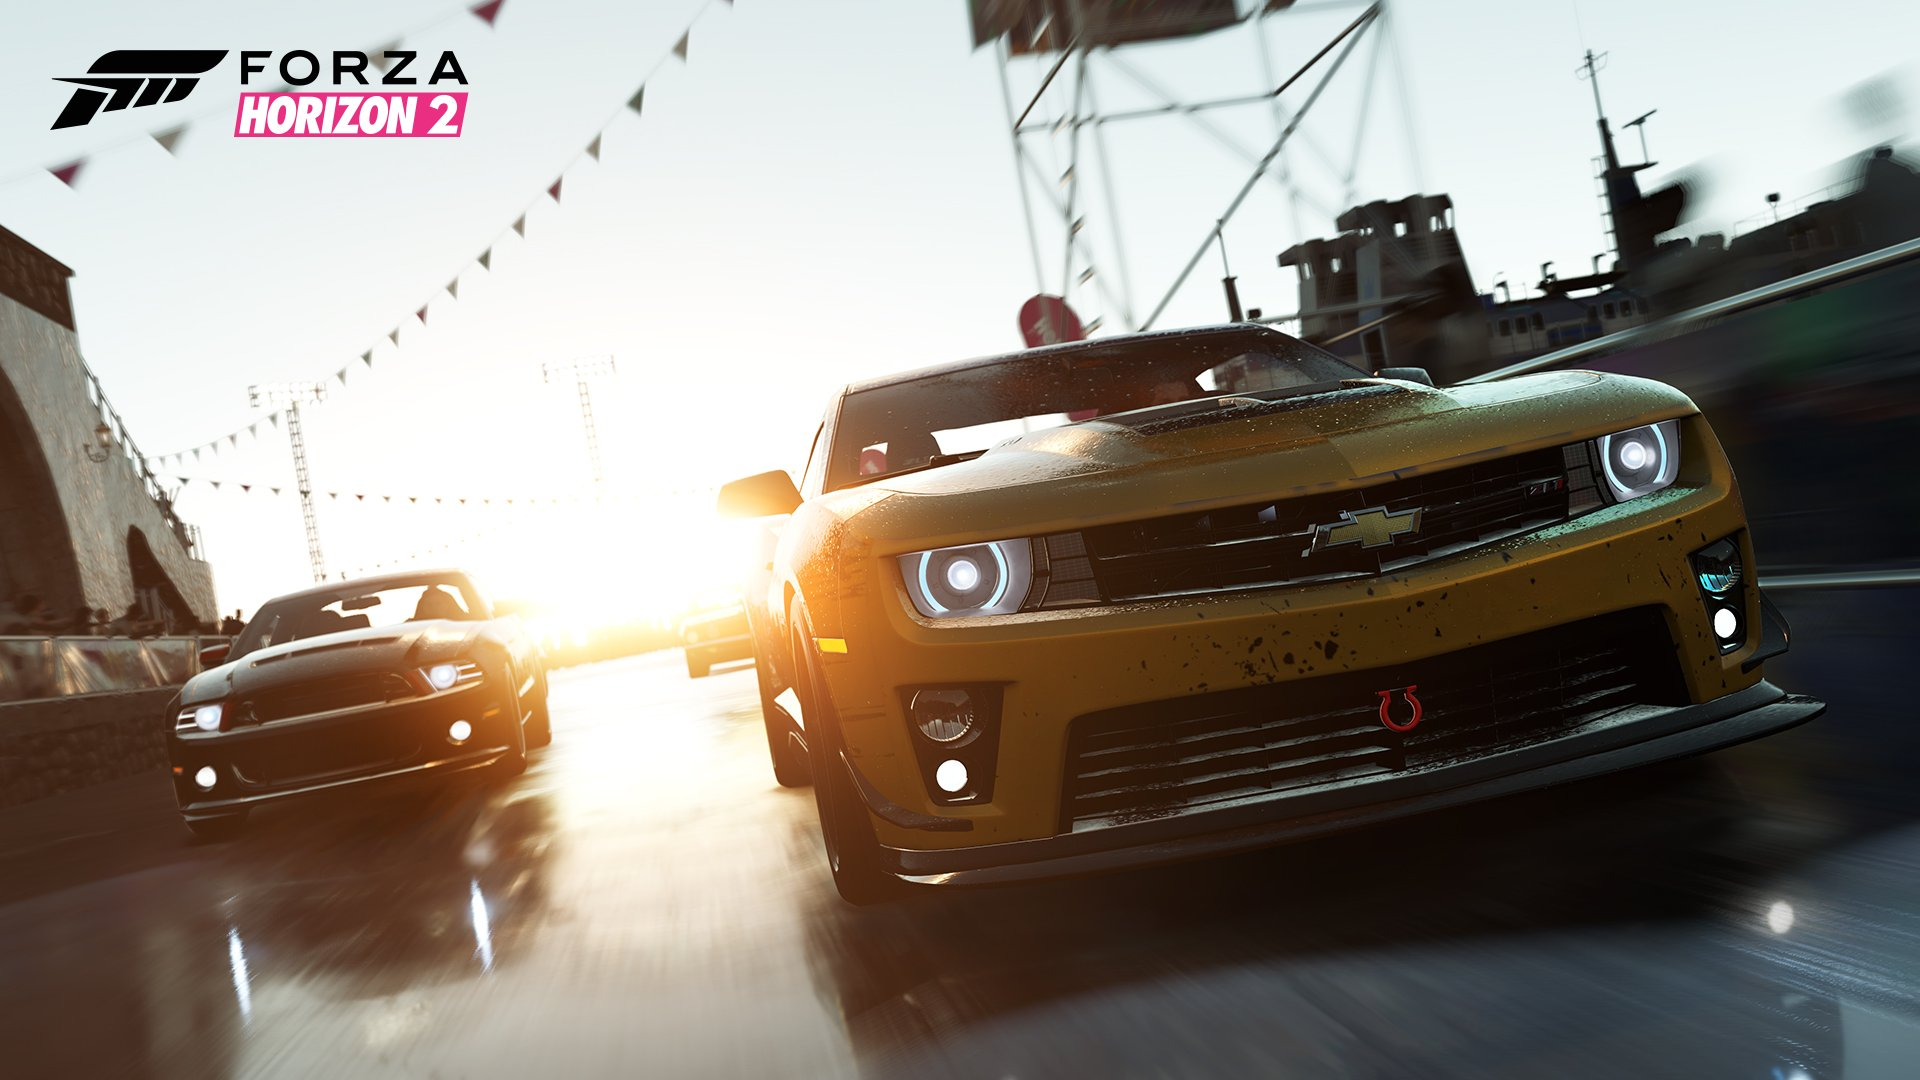 Forza Horizon 2 Released Hub App Announced Inside Sim